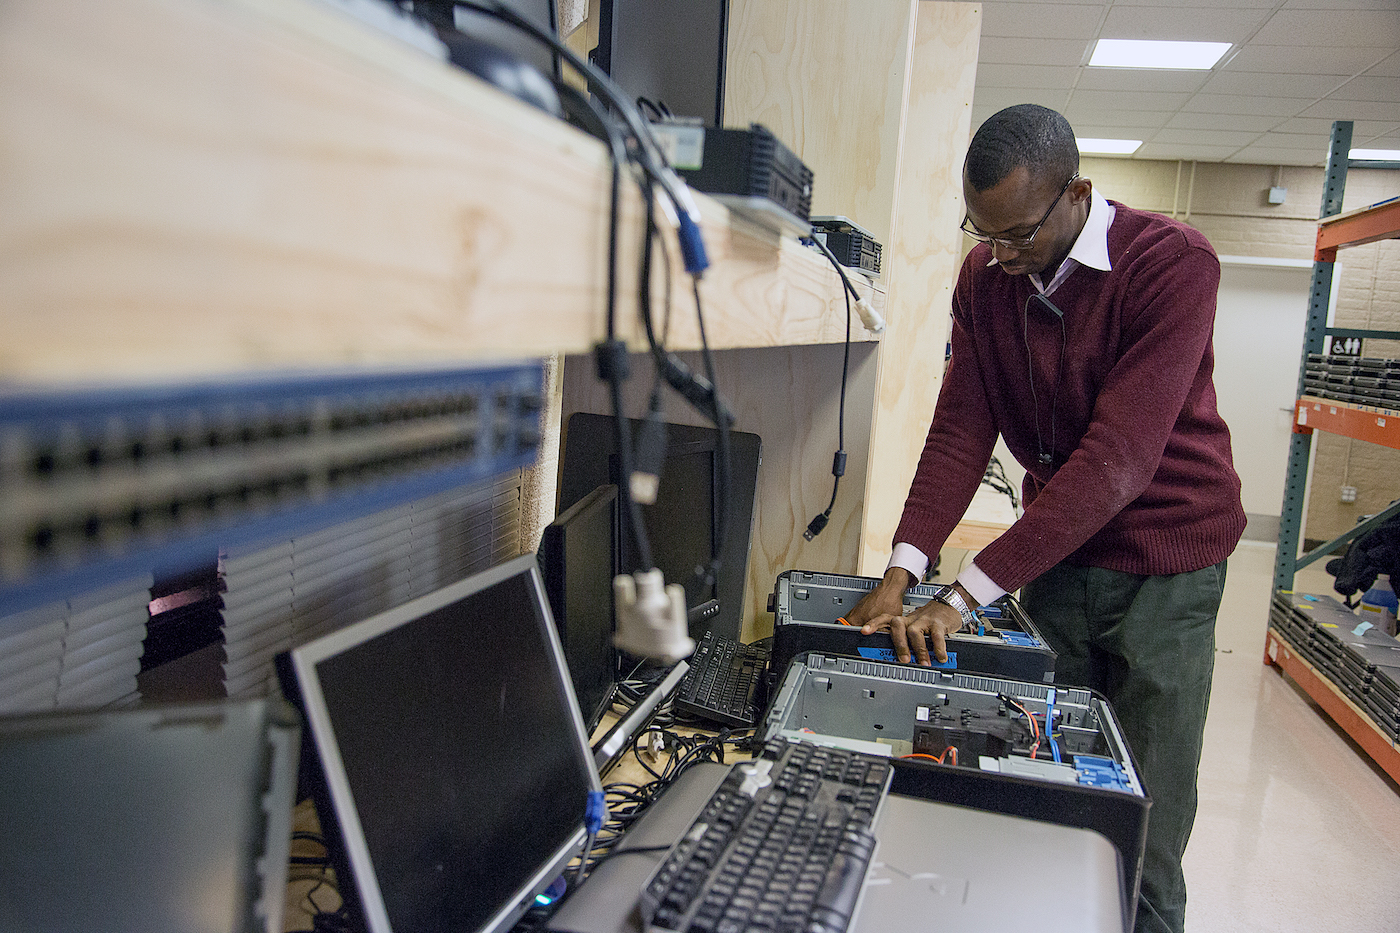 Ward 8 resident learns the art of computer refurbishing. (Courtesy photo)